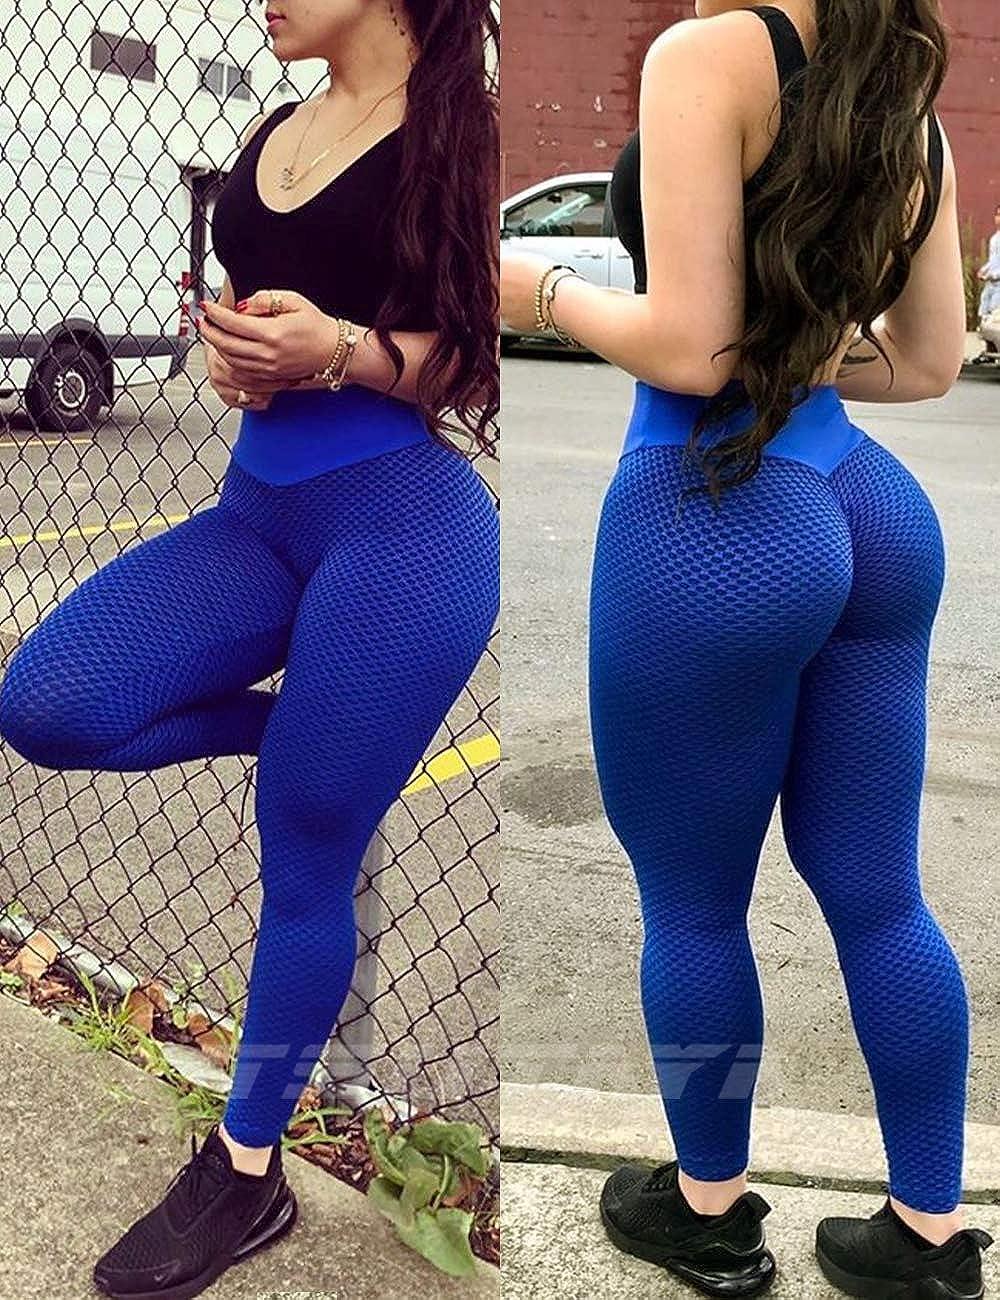 TSUTAYA Womens Ruched Butt Lifting Yoga Pants High Waist Tummy Control Push Up Workout Leggings Textured Booty Tights